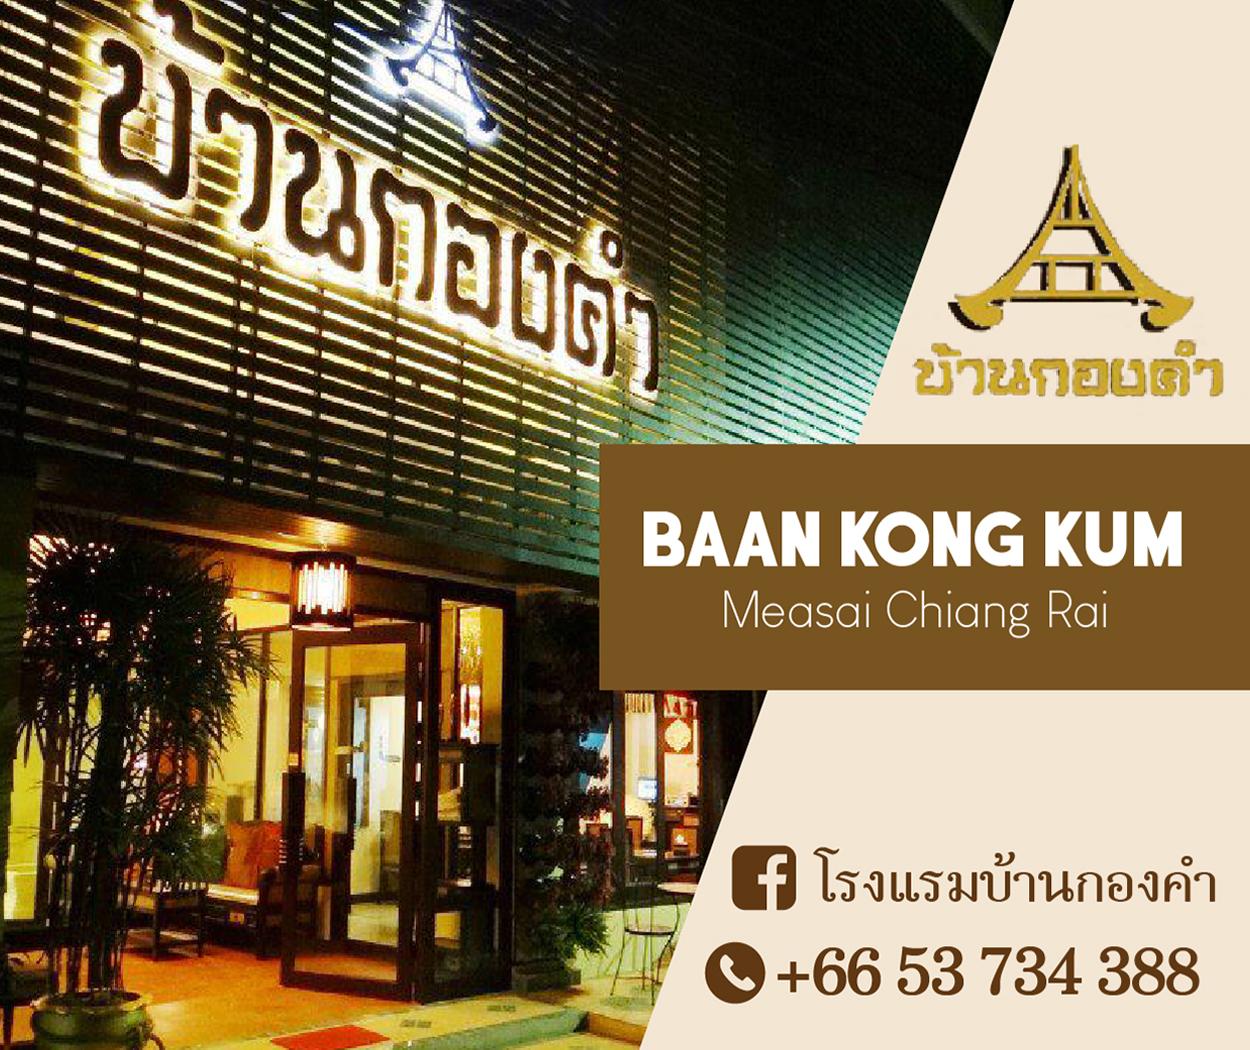 Baan Kong Kum Chiang Rai (TouristAttraction_Banner) 1200Baht, on May 30, 2019